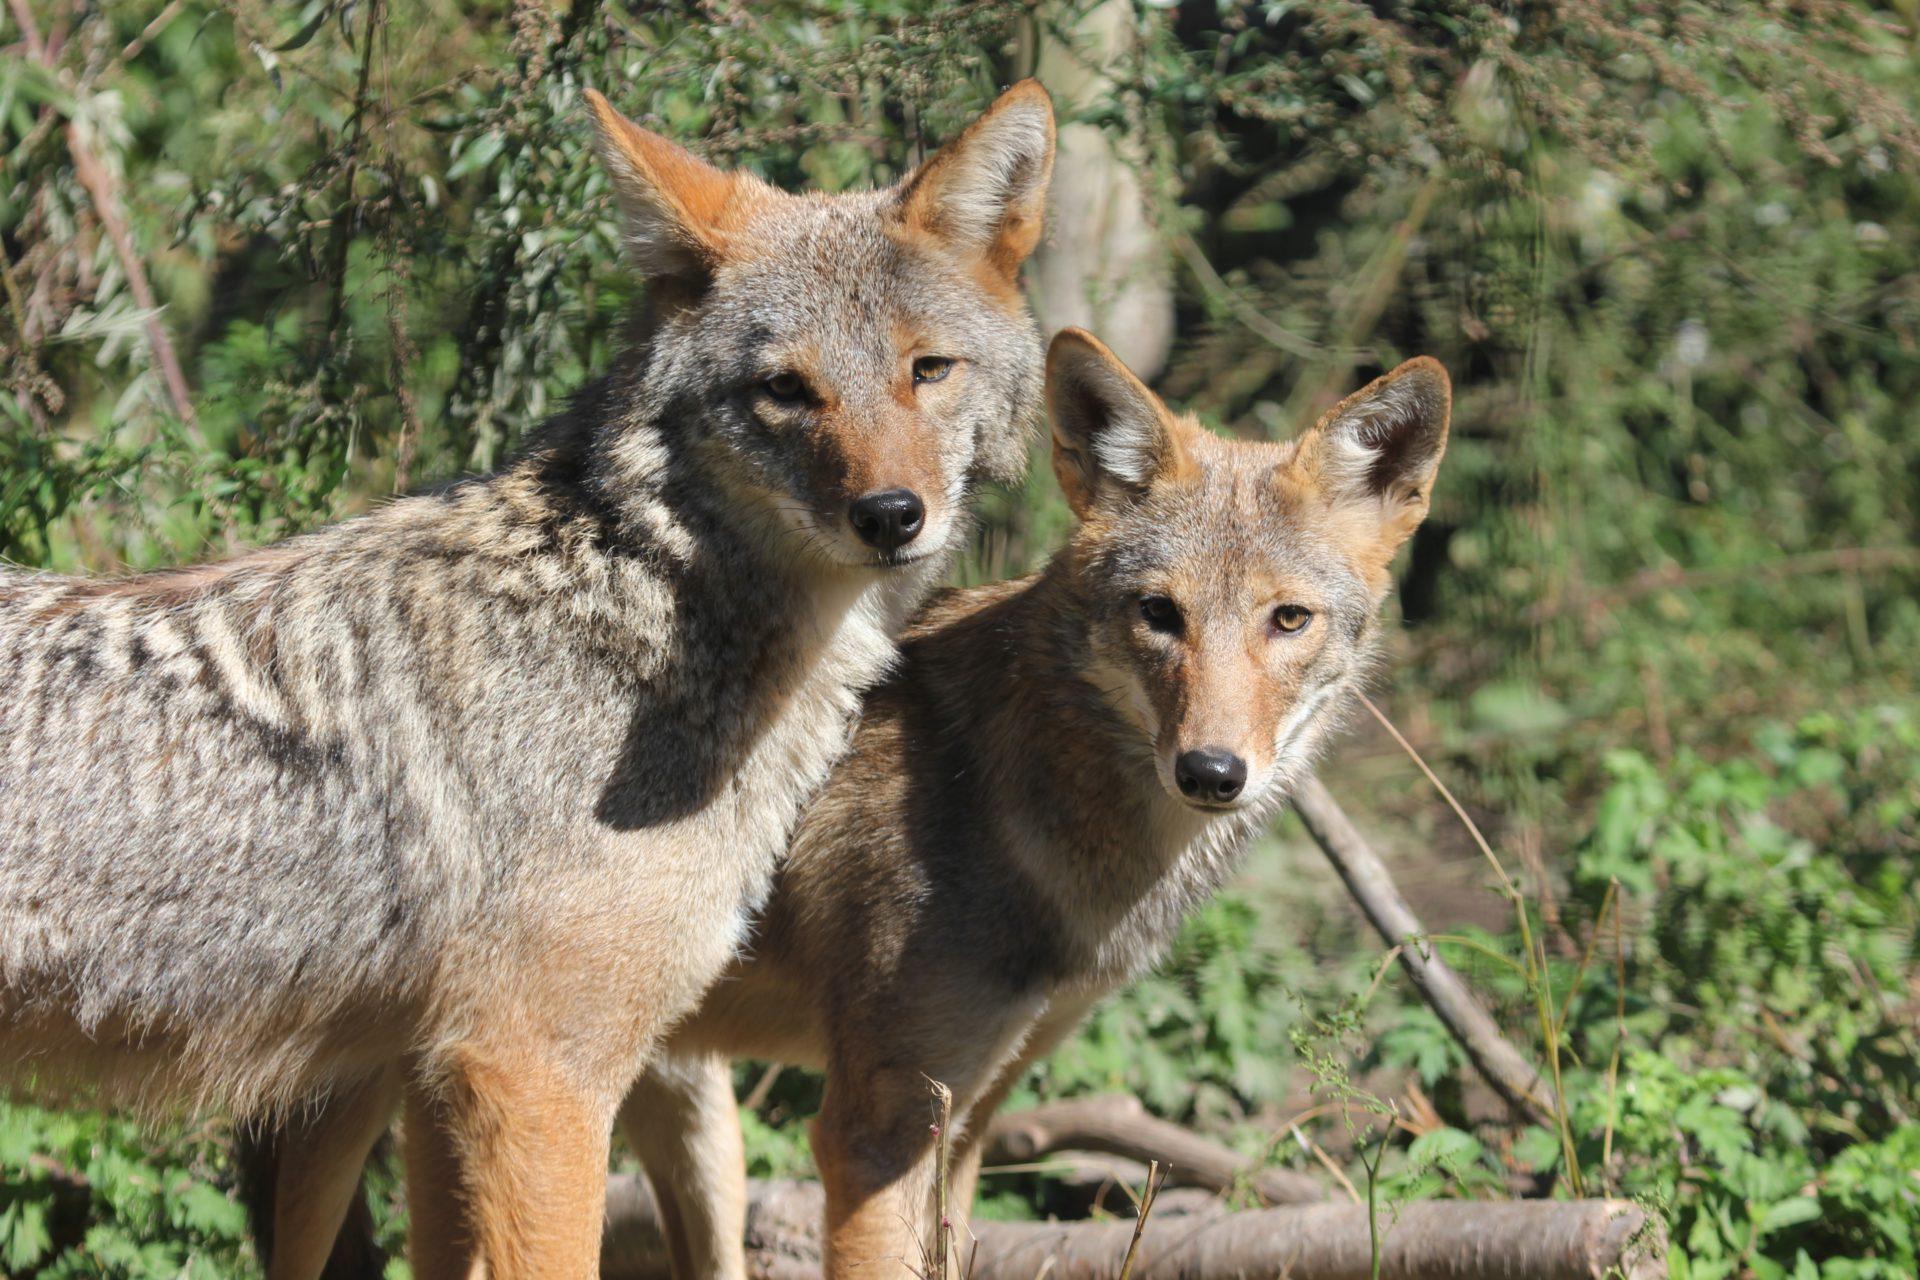 New coyote the latest addition to zoo's animal ambassador program